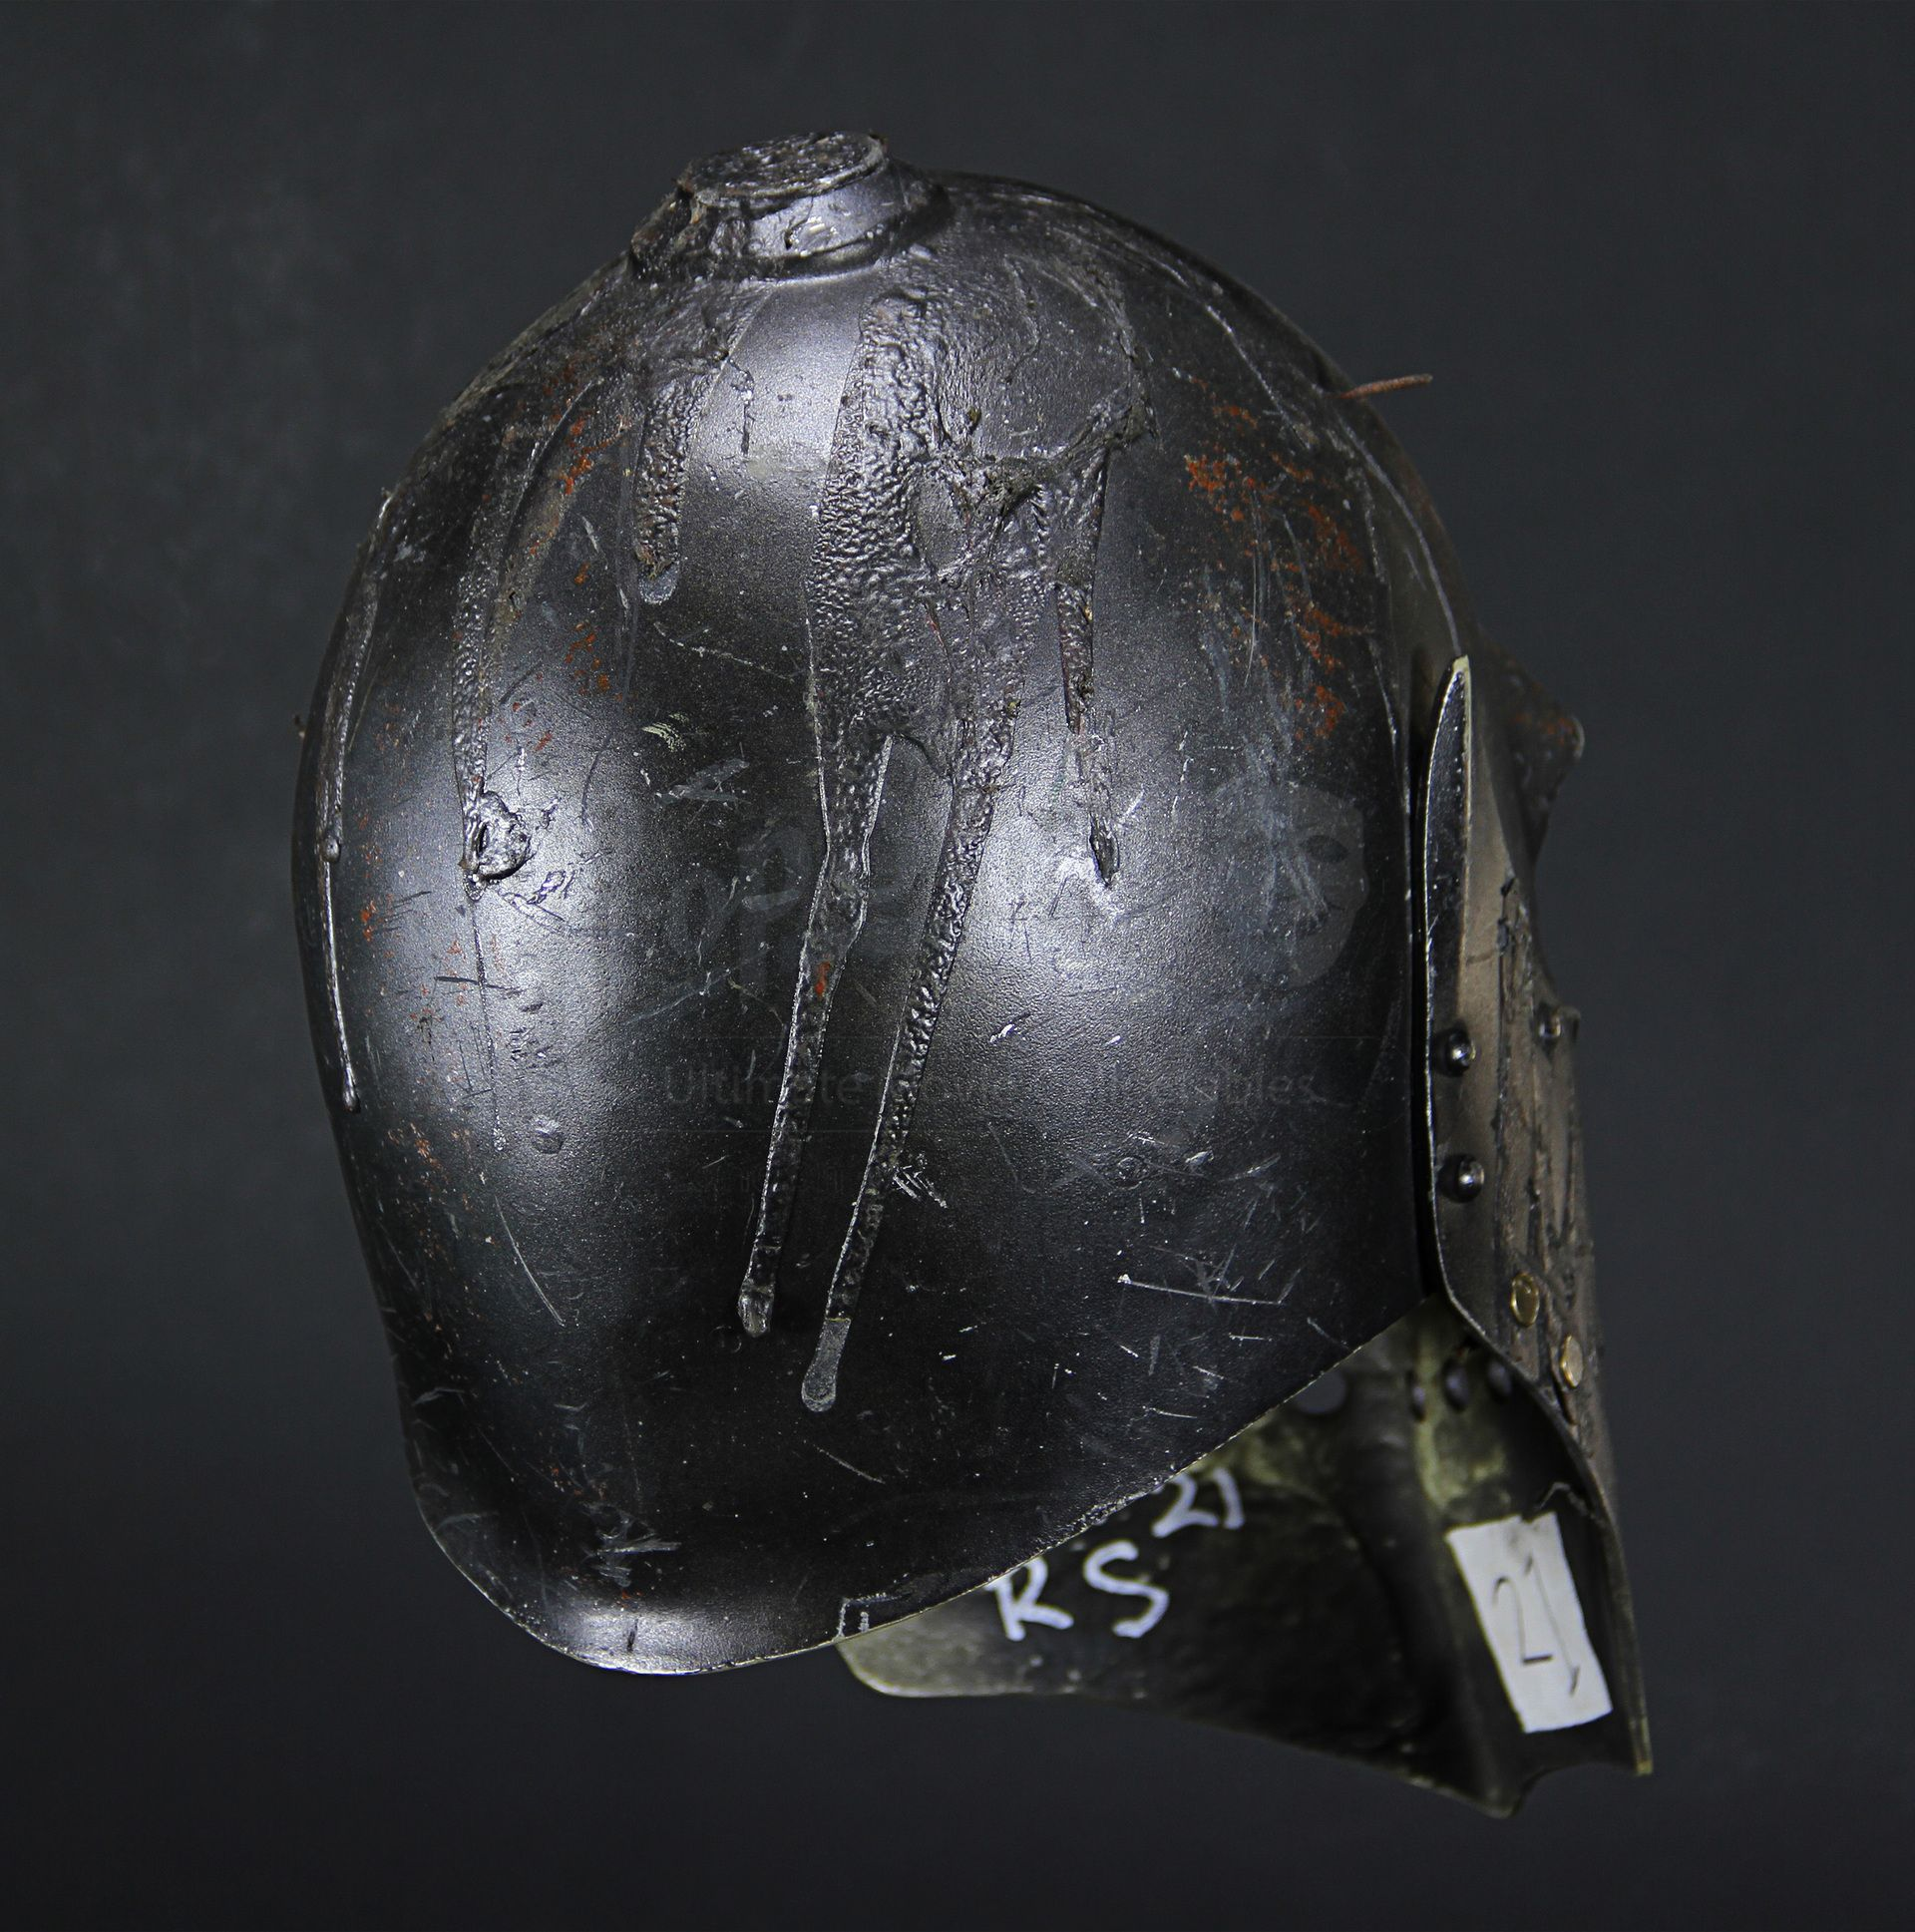 Marauder Helmet | Prop Store - Ultimate Movie Collectables